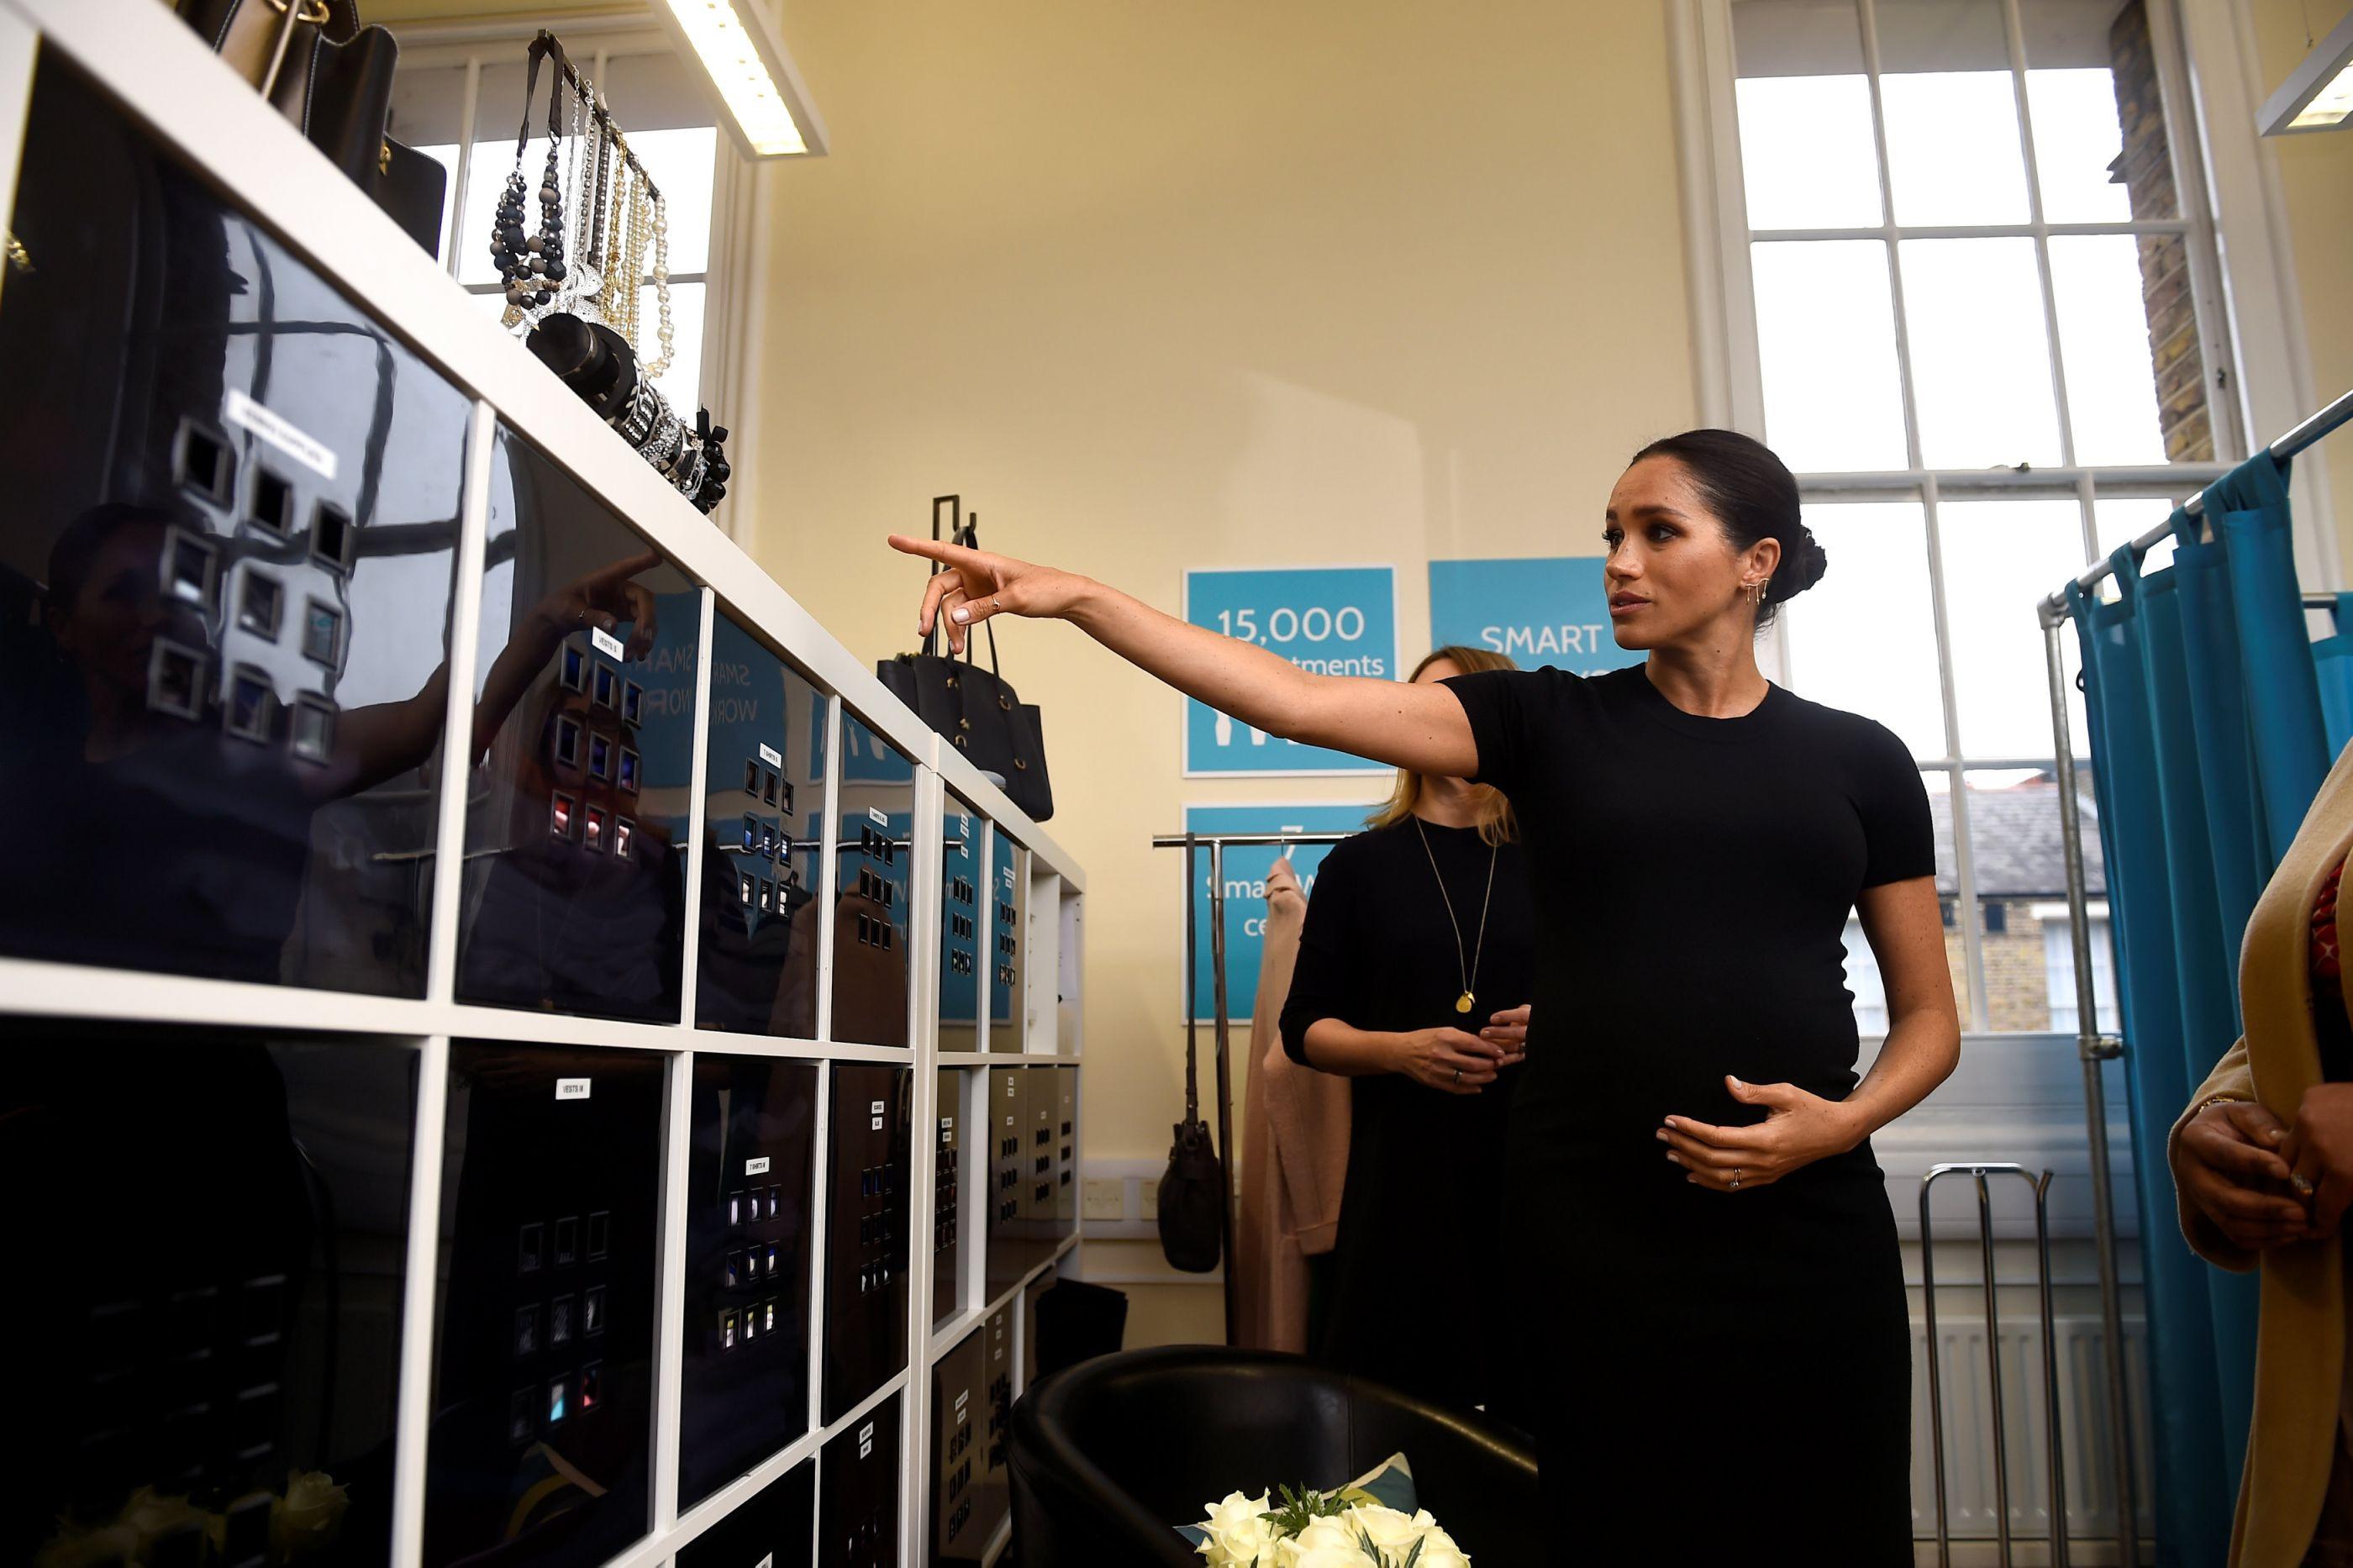 Grávida, Meghan Markle deslumbra numa importante visita como duquesa